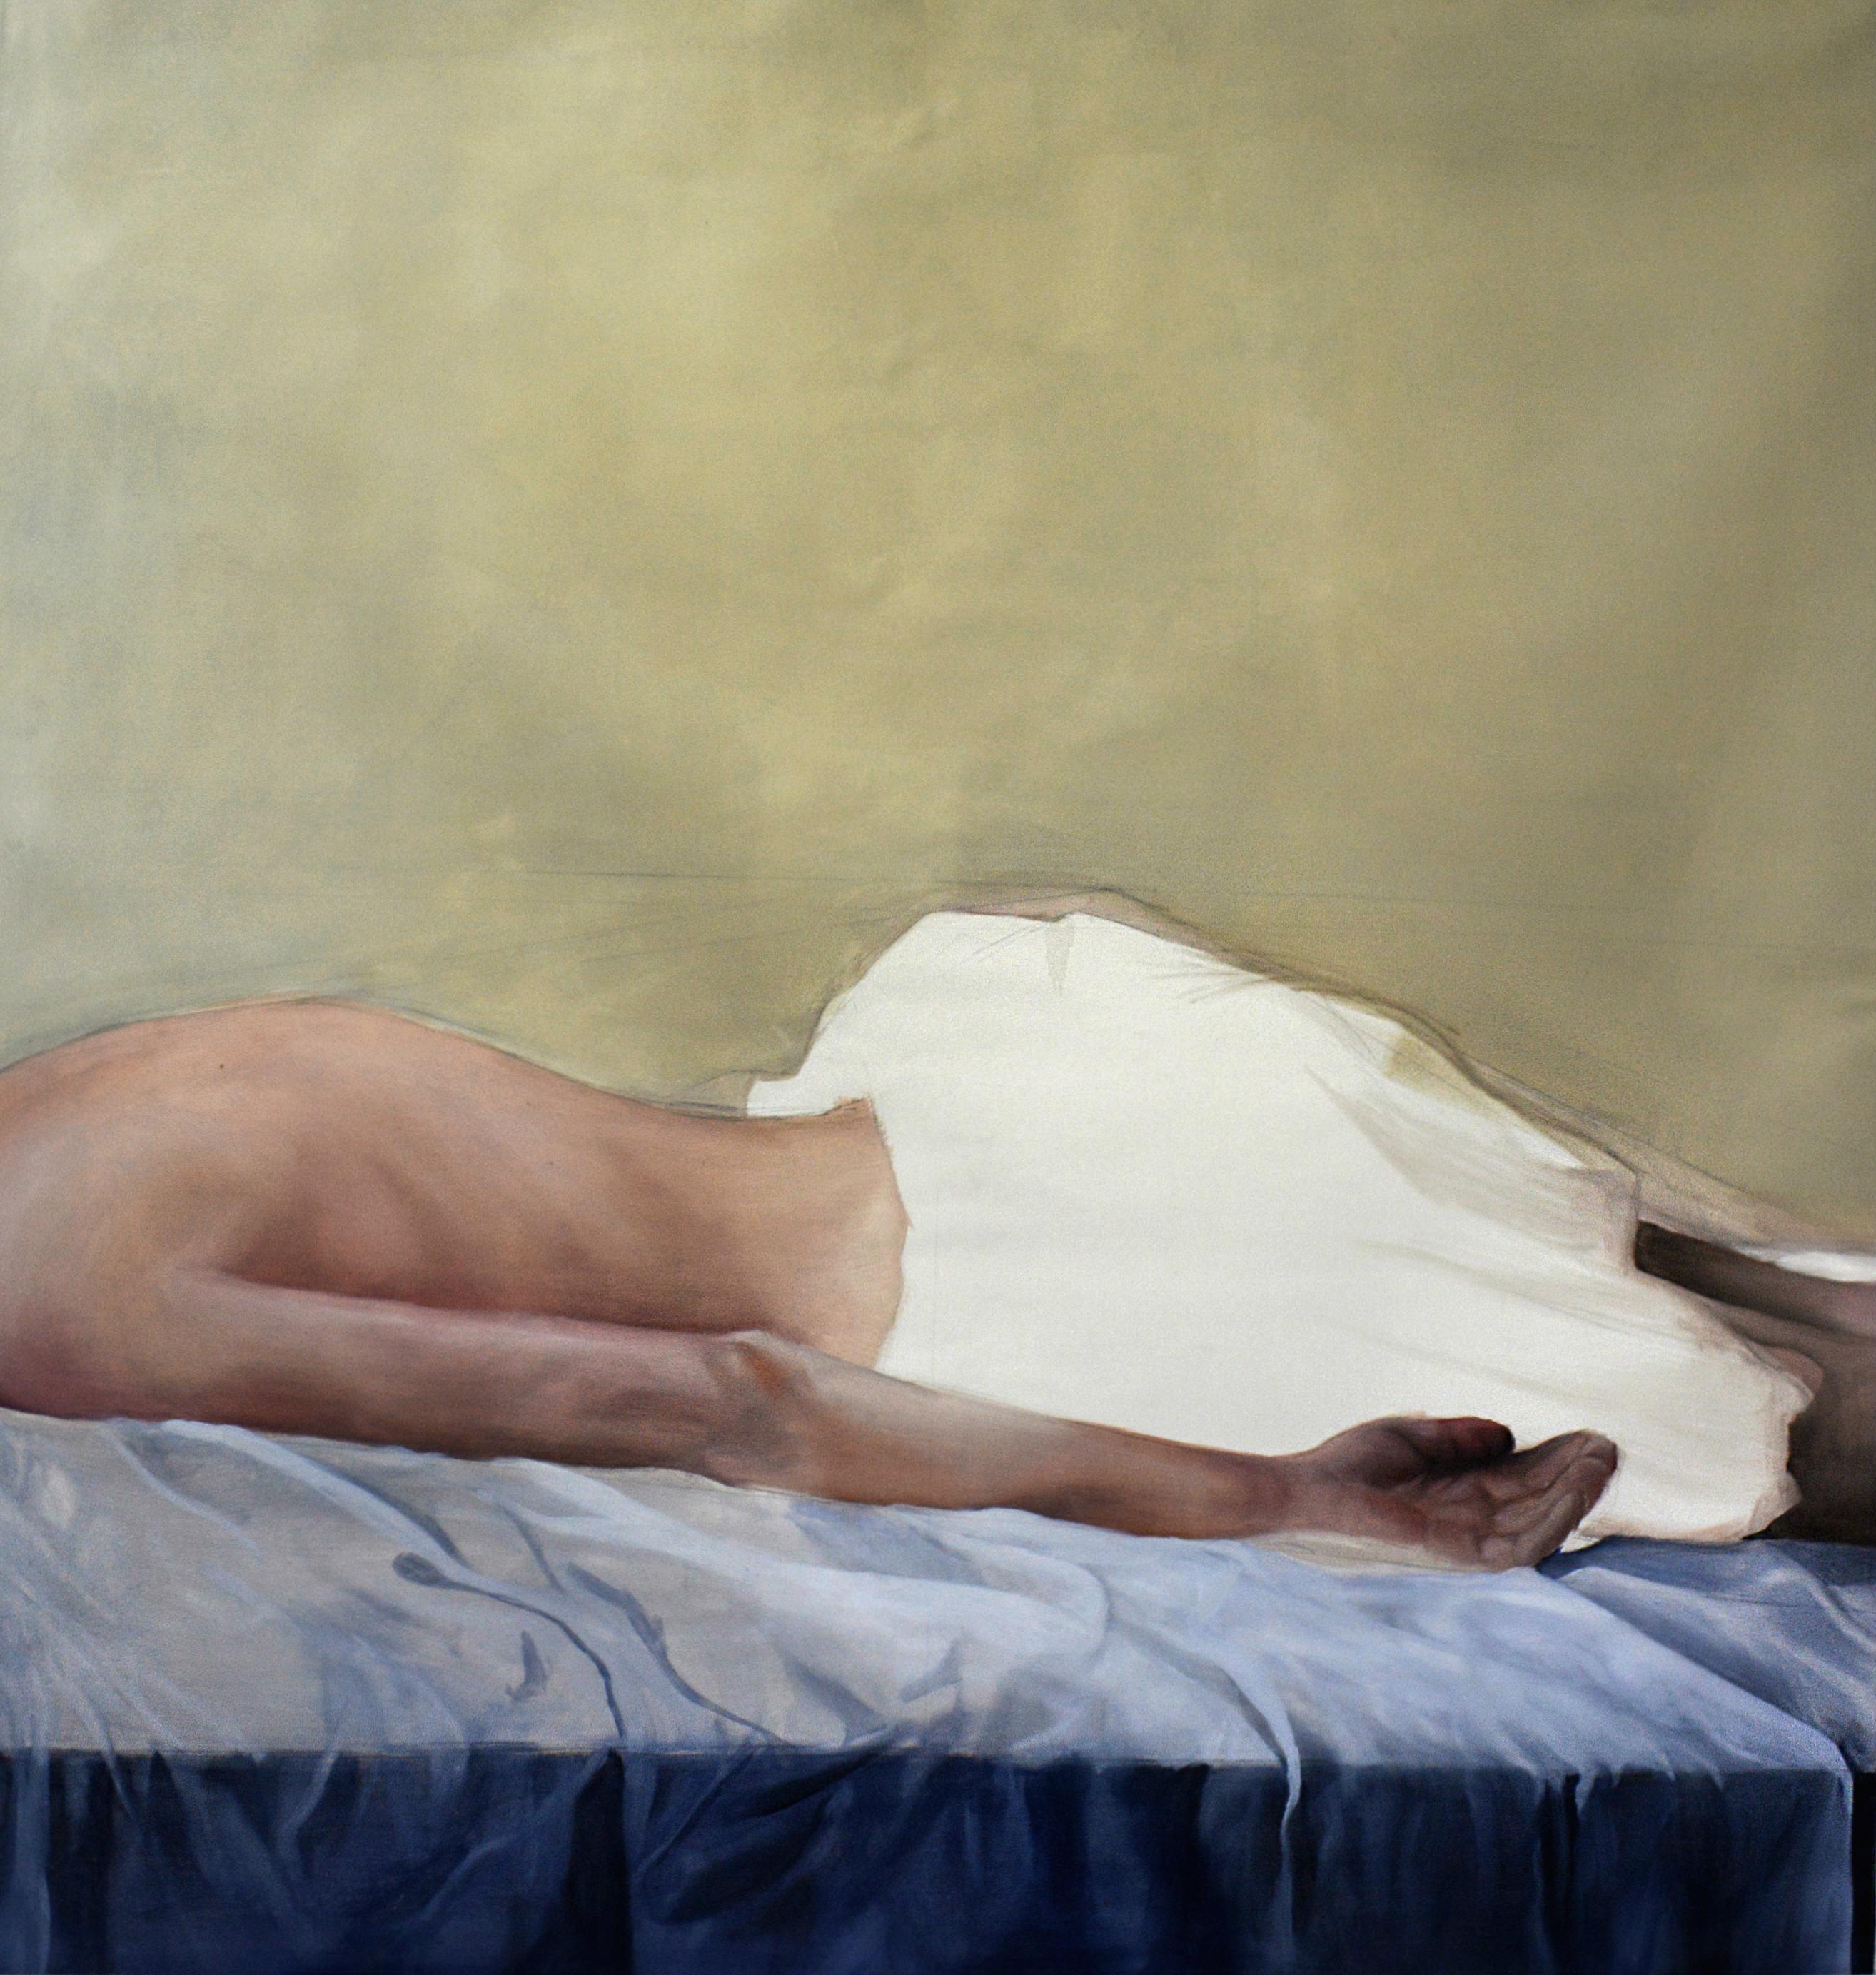 Dimitris Vavouras, Untitled, 2016, oil on canvas, 150x160 cm